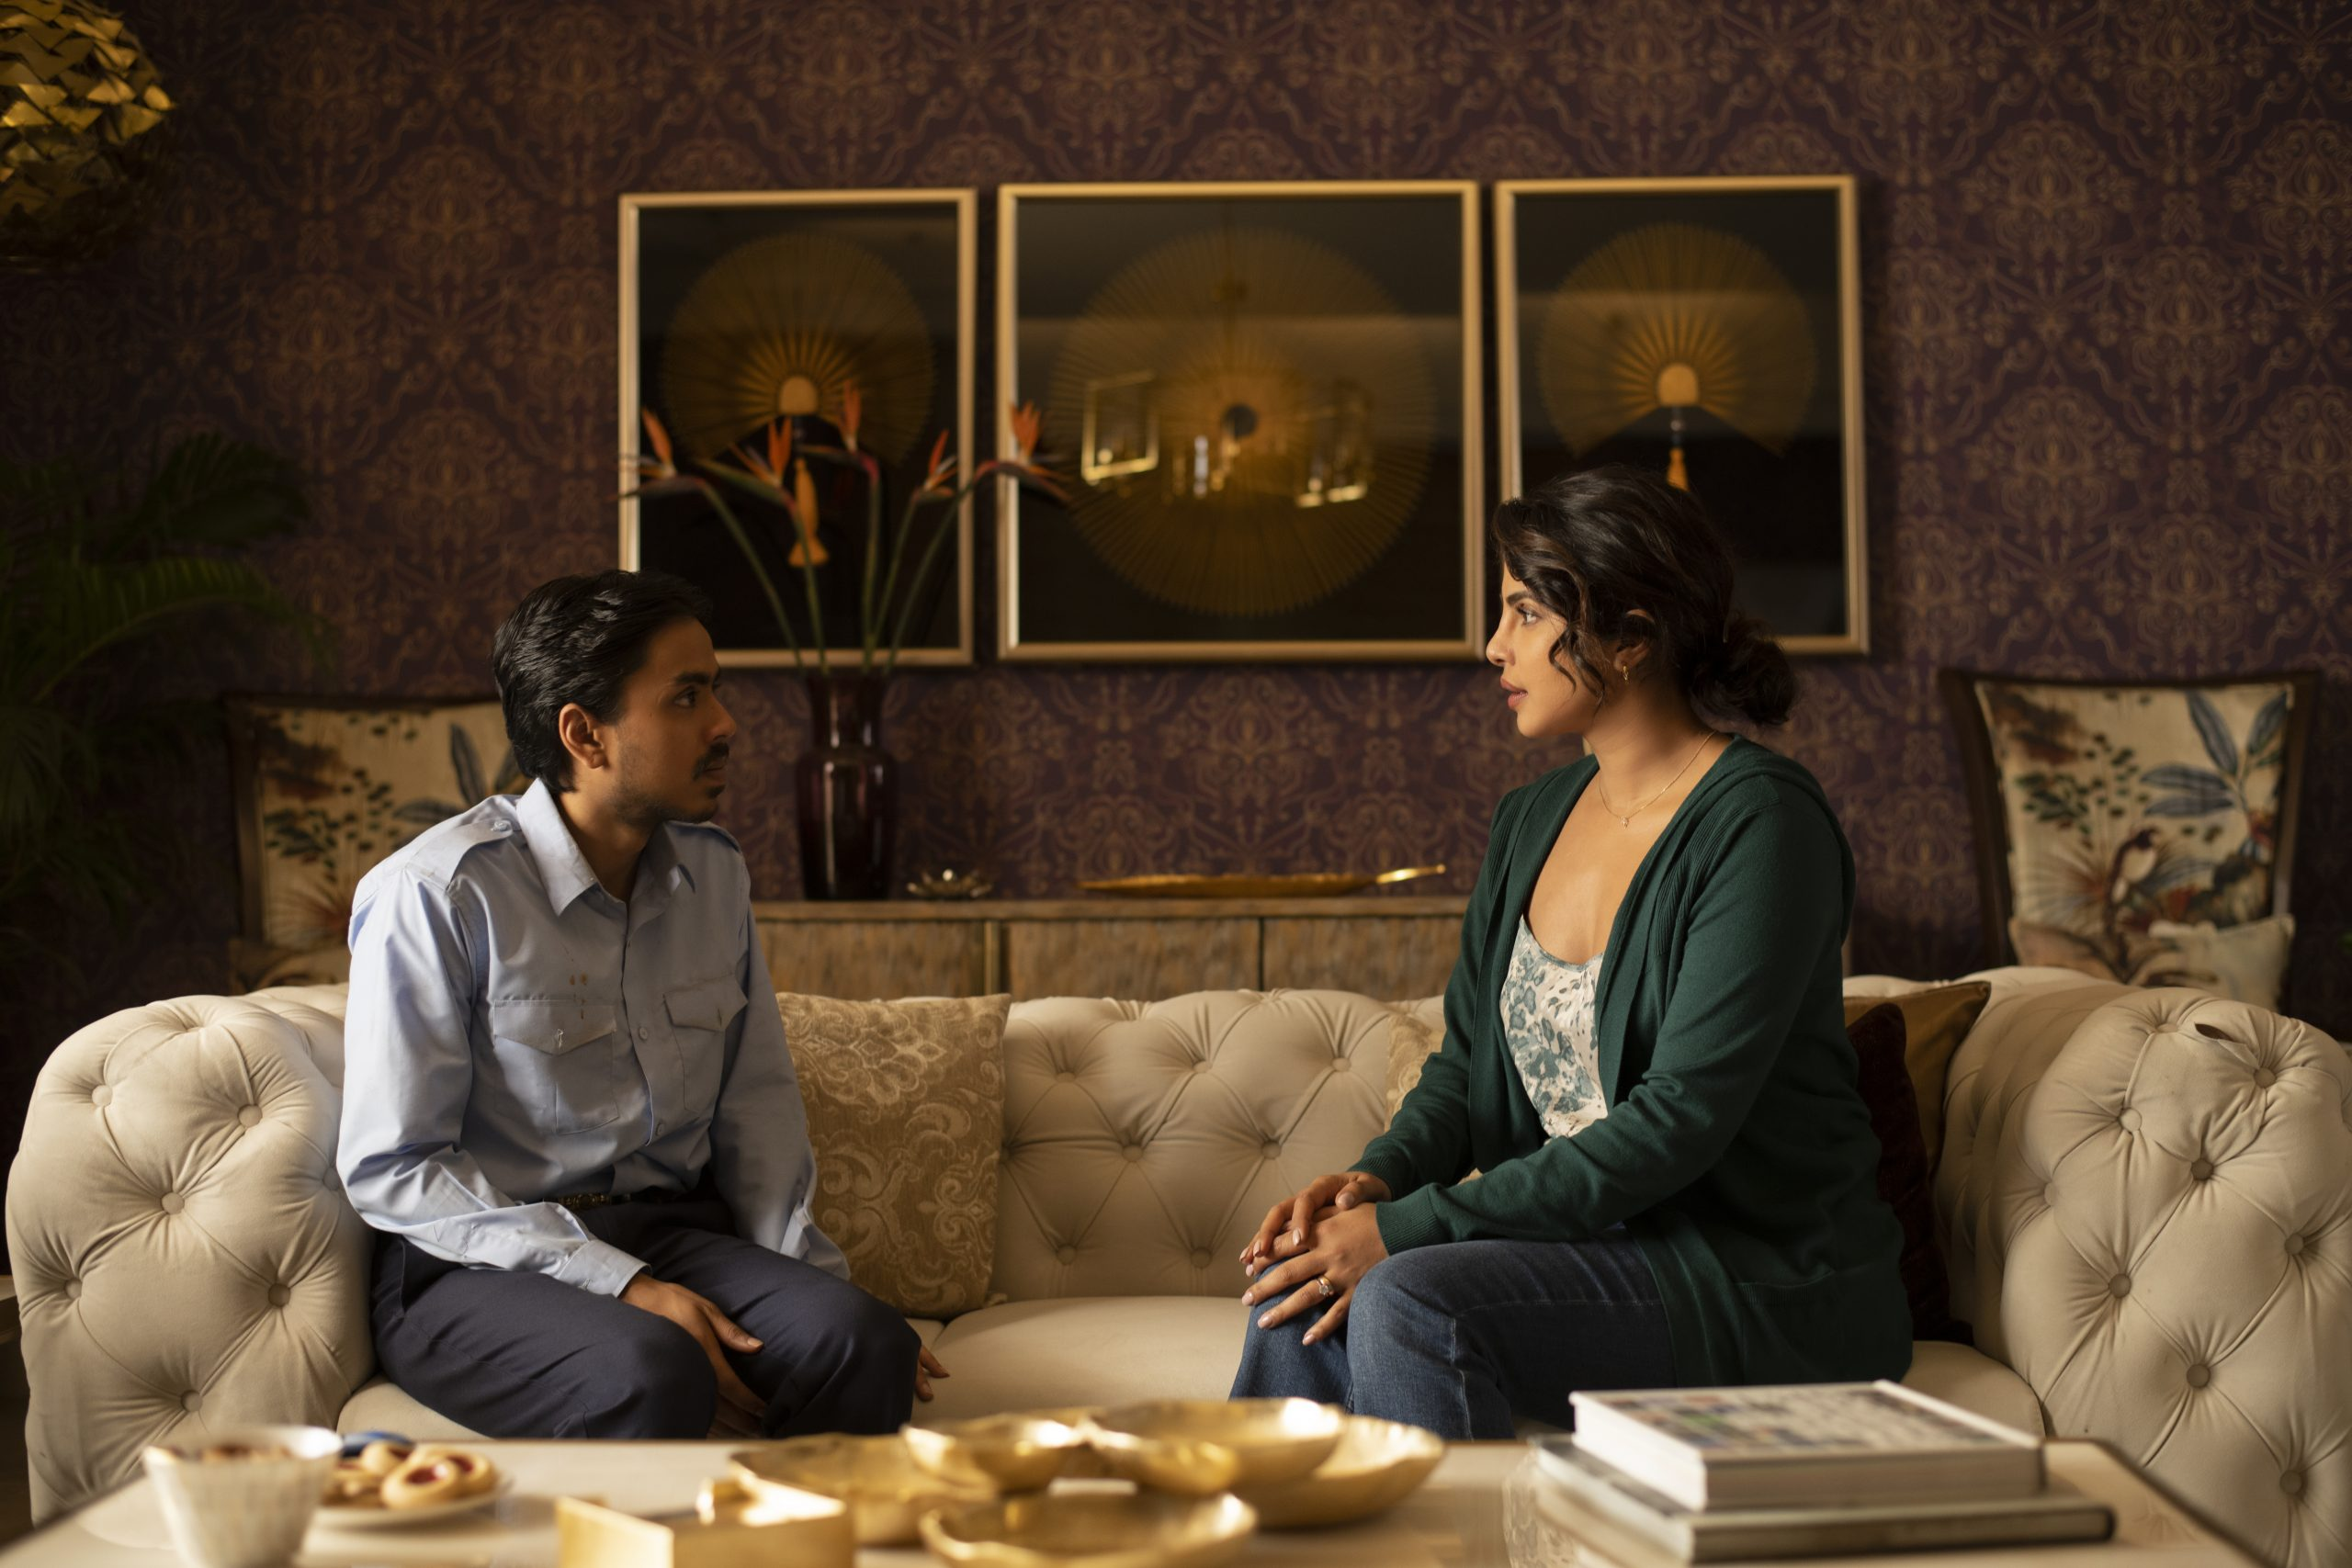 A scene from the movie featuring Pinky played by Priyanka Chopra Jonas